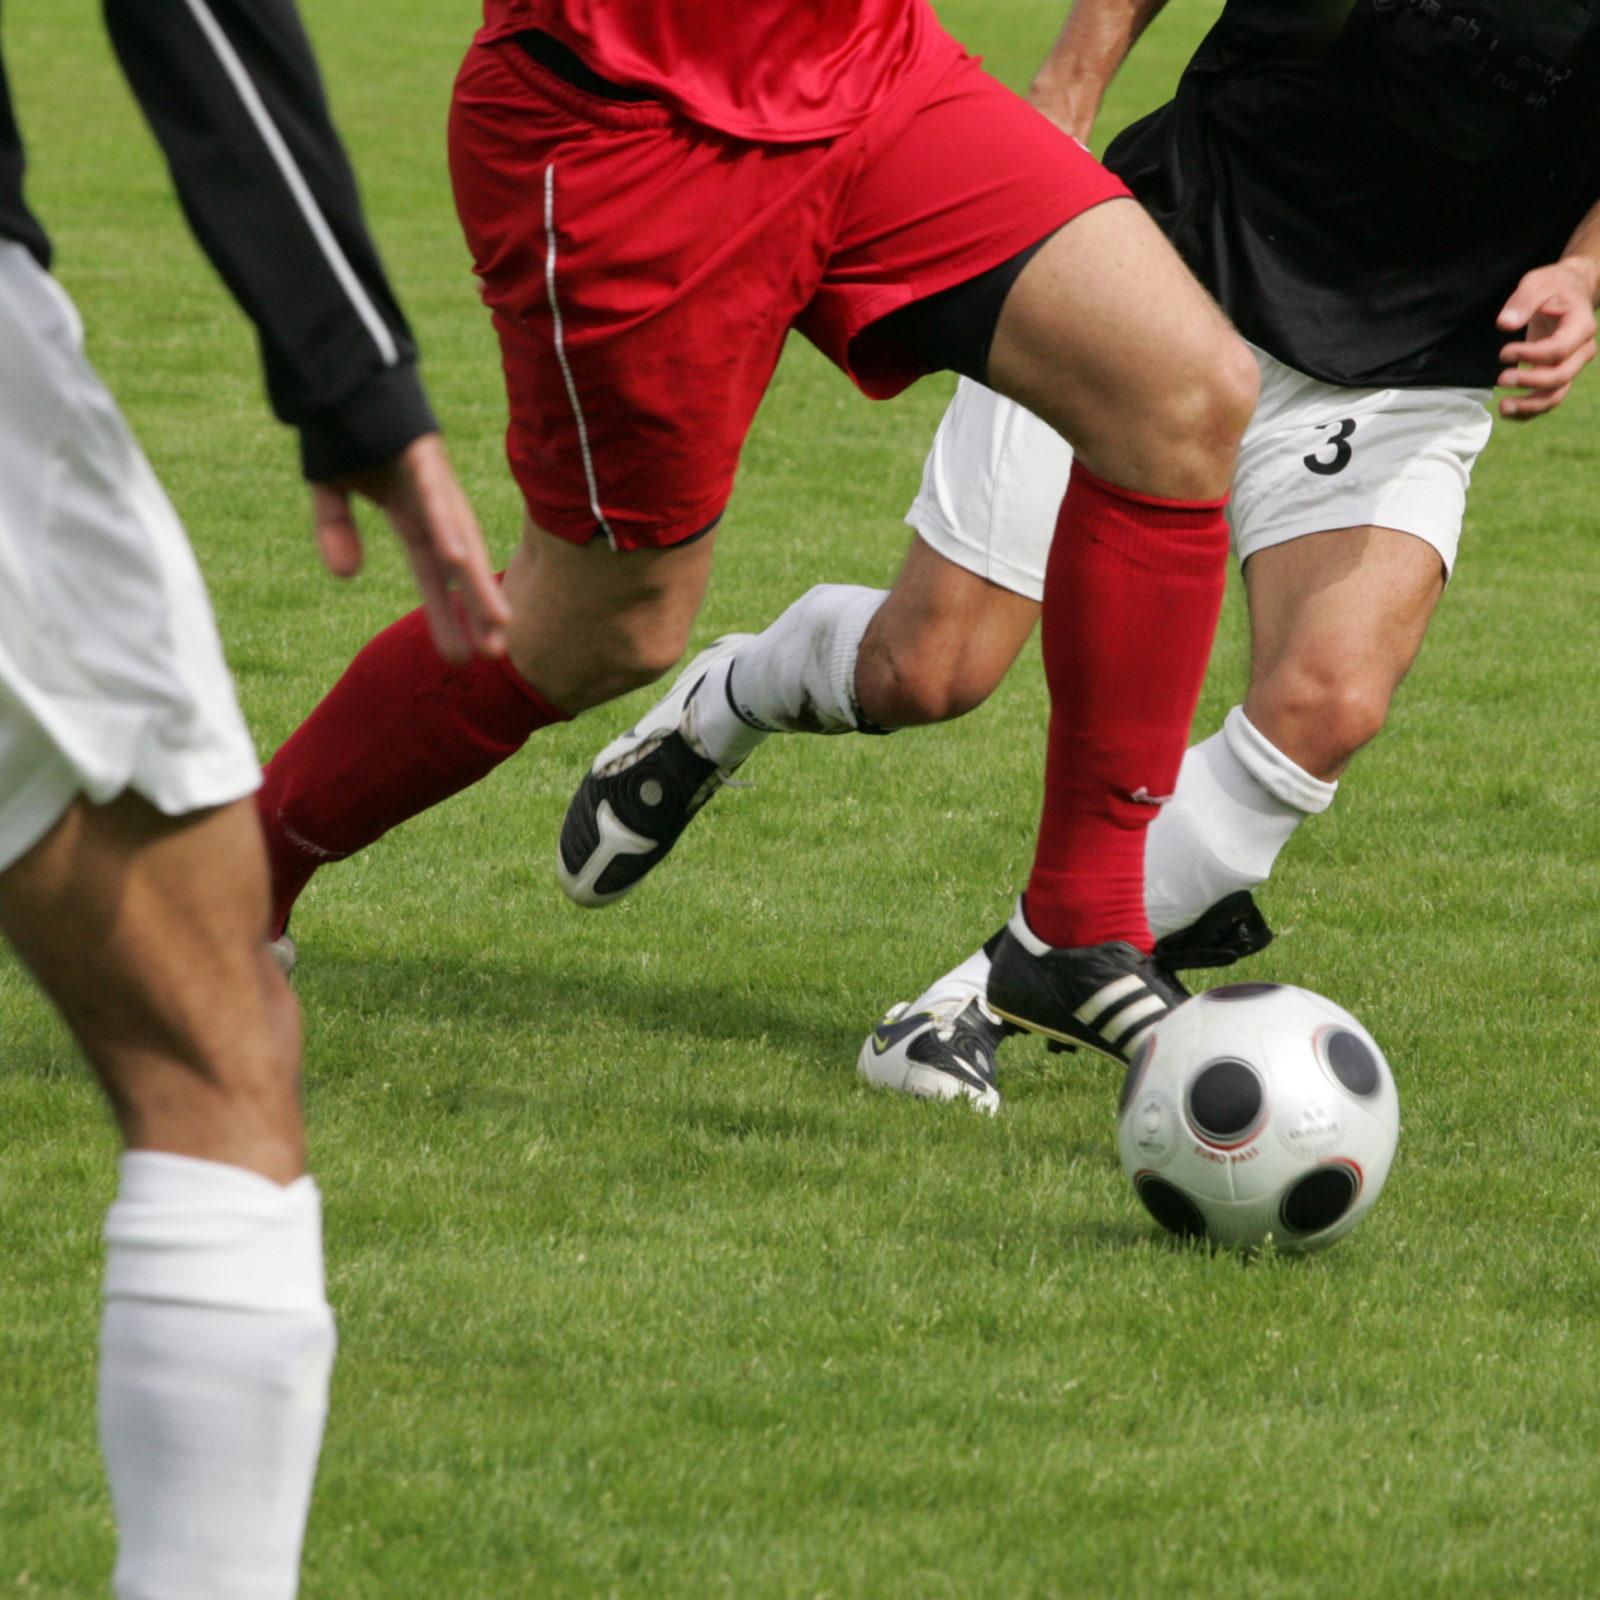 Recent-developments-in-football